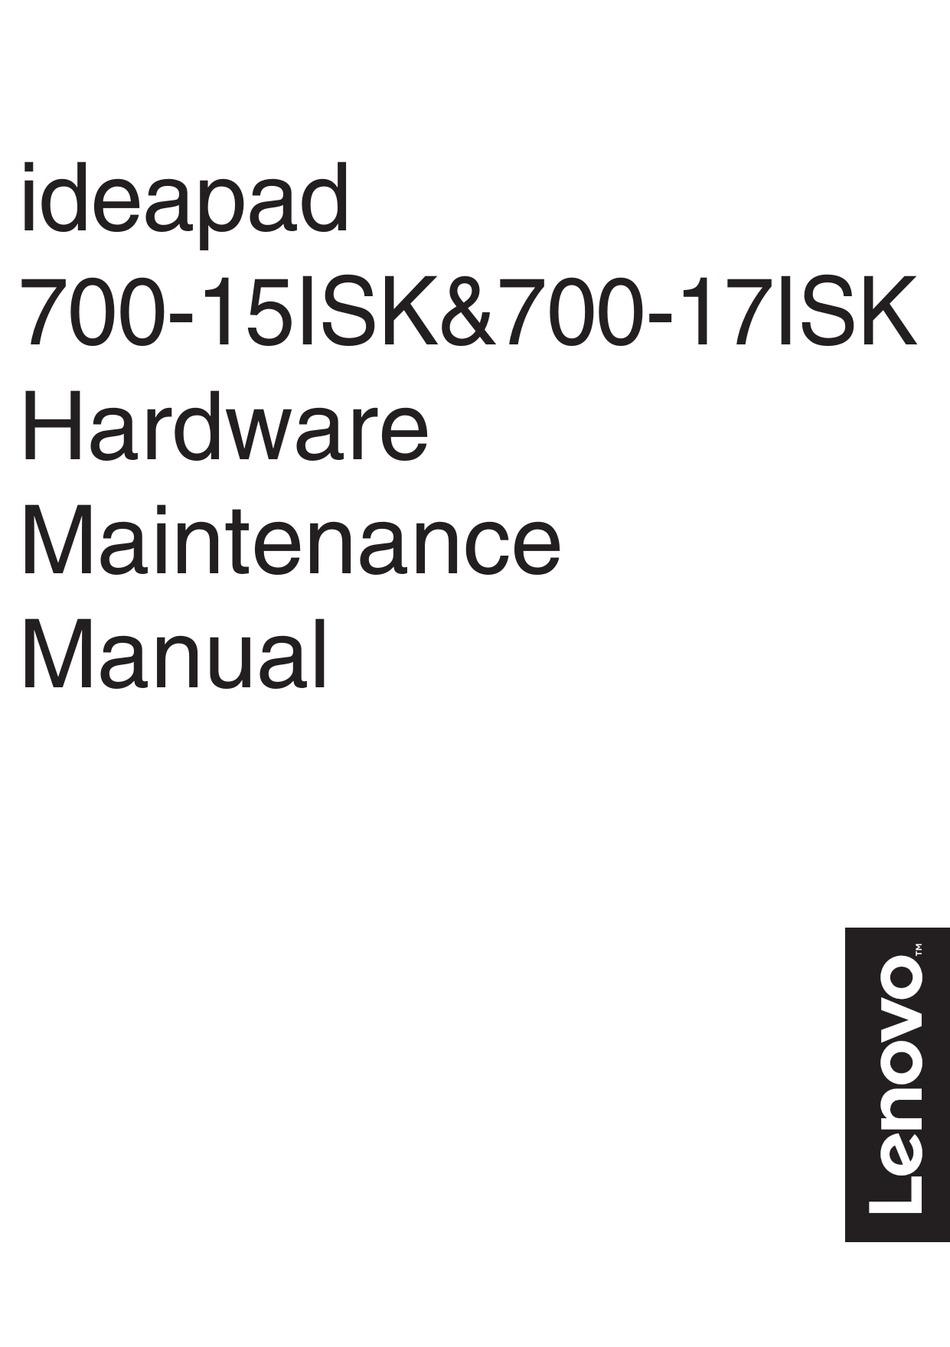 LENOVO IDEAPAD 700-15ISK HARDWARE MAINTENANCE MANUAL Pdf